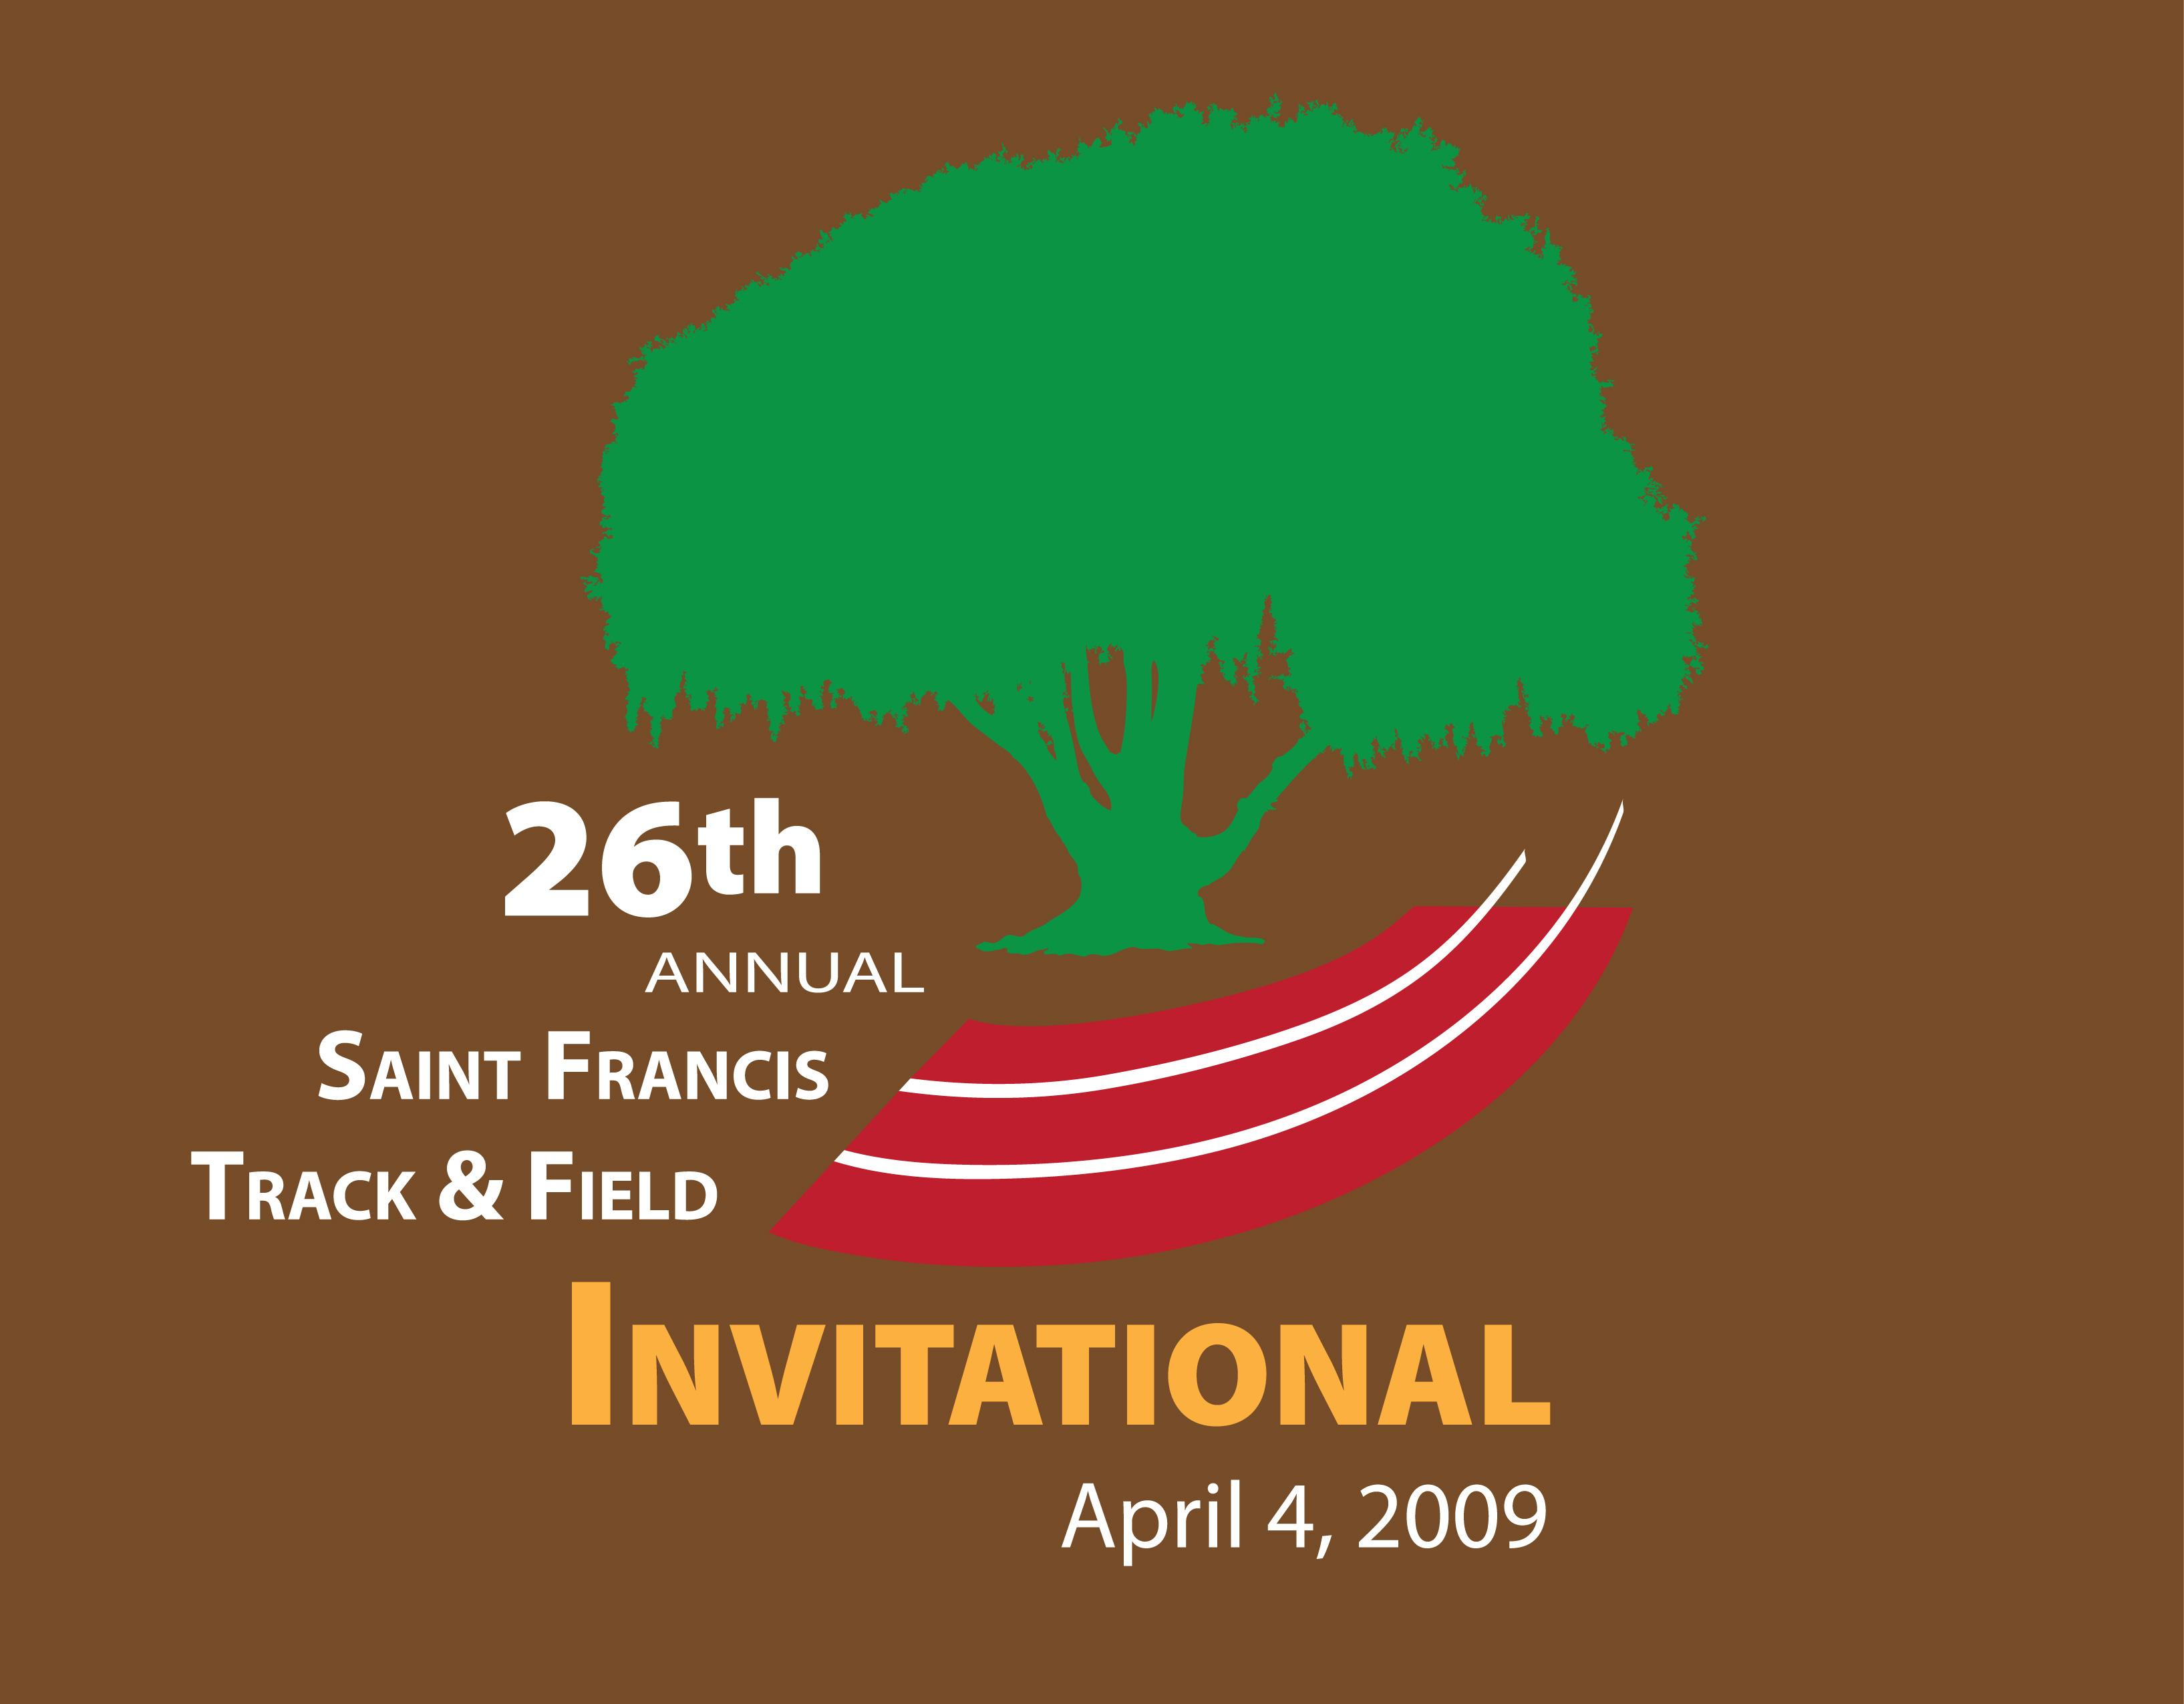 st francis high school track meet 2013